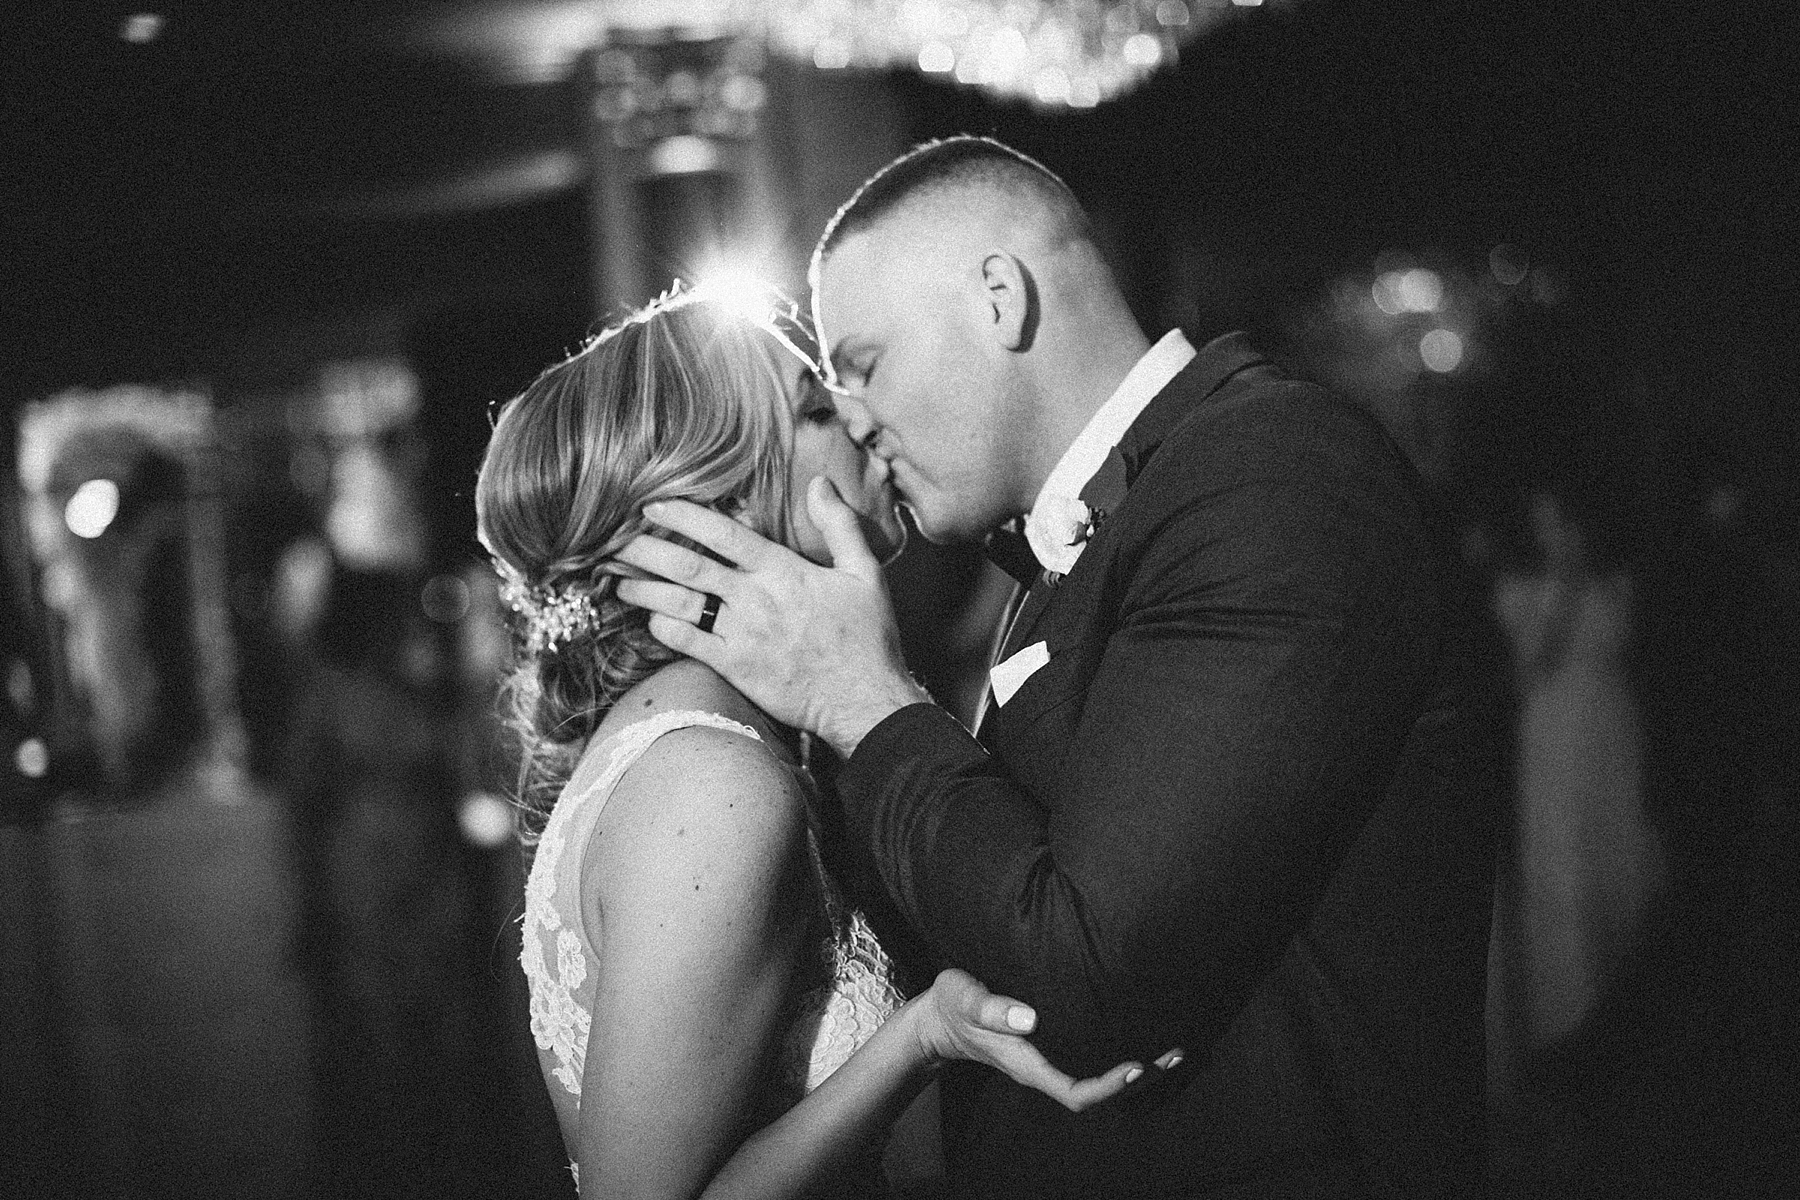 cranford-washington-nj-wedding-photographer-seasons_0034.jpg